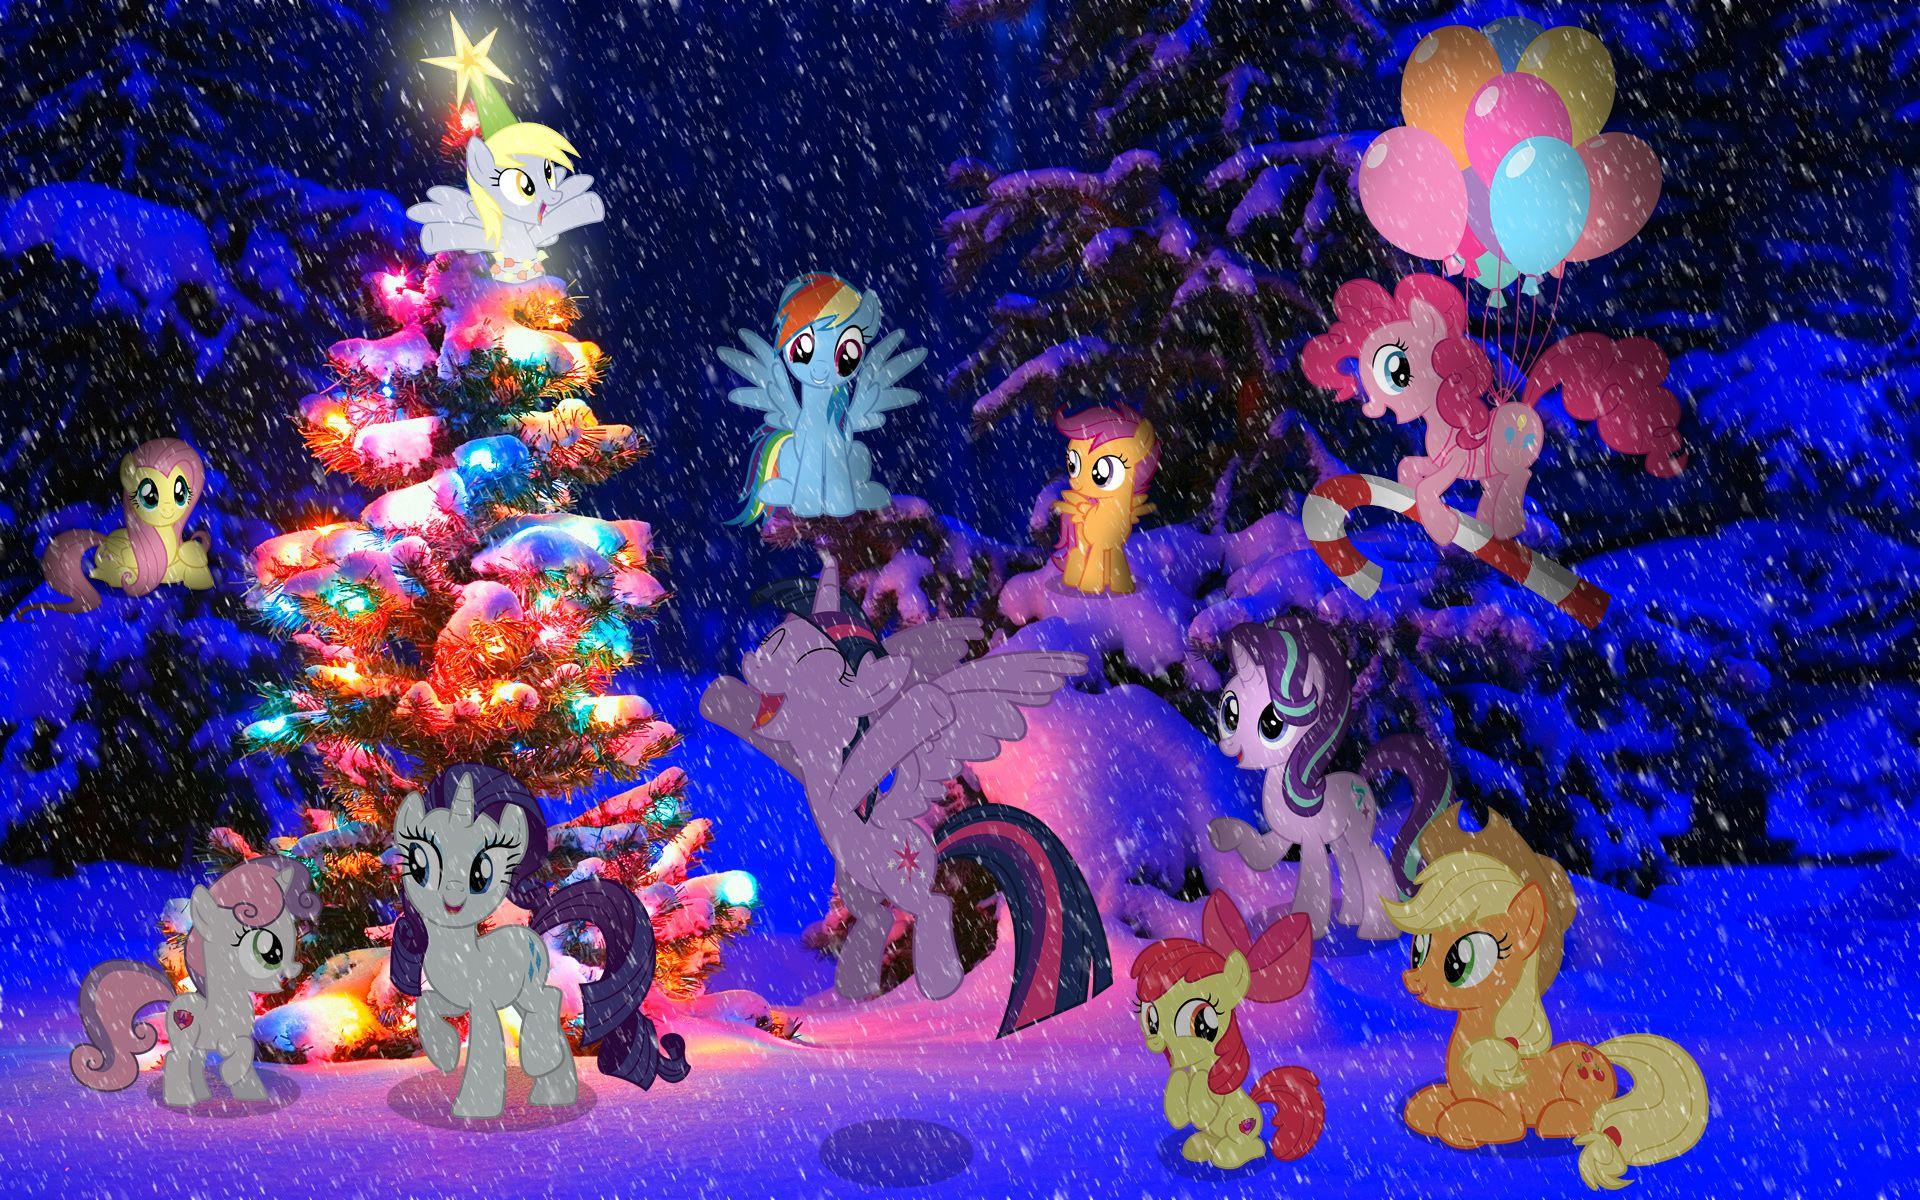 christmas wallpaper hd desktop collection | hd wallpapers